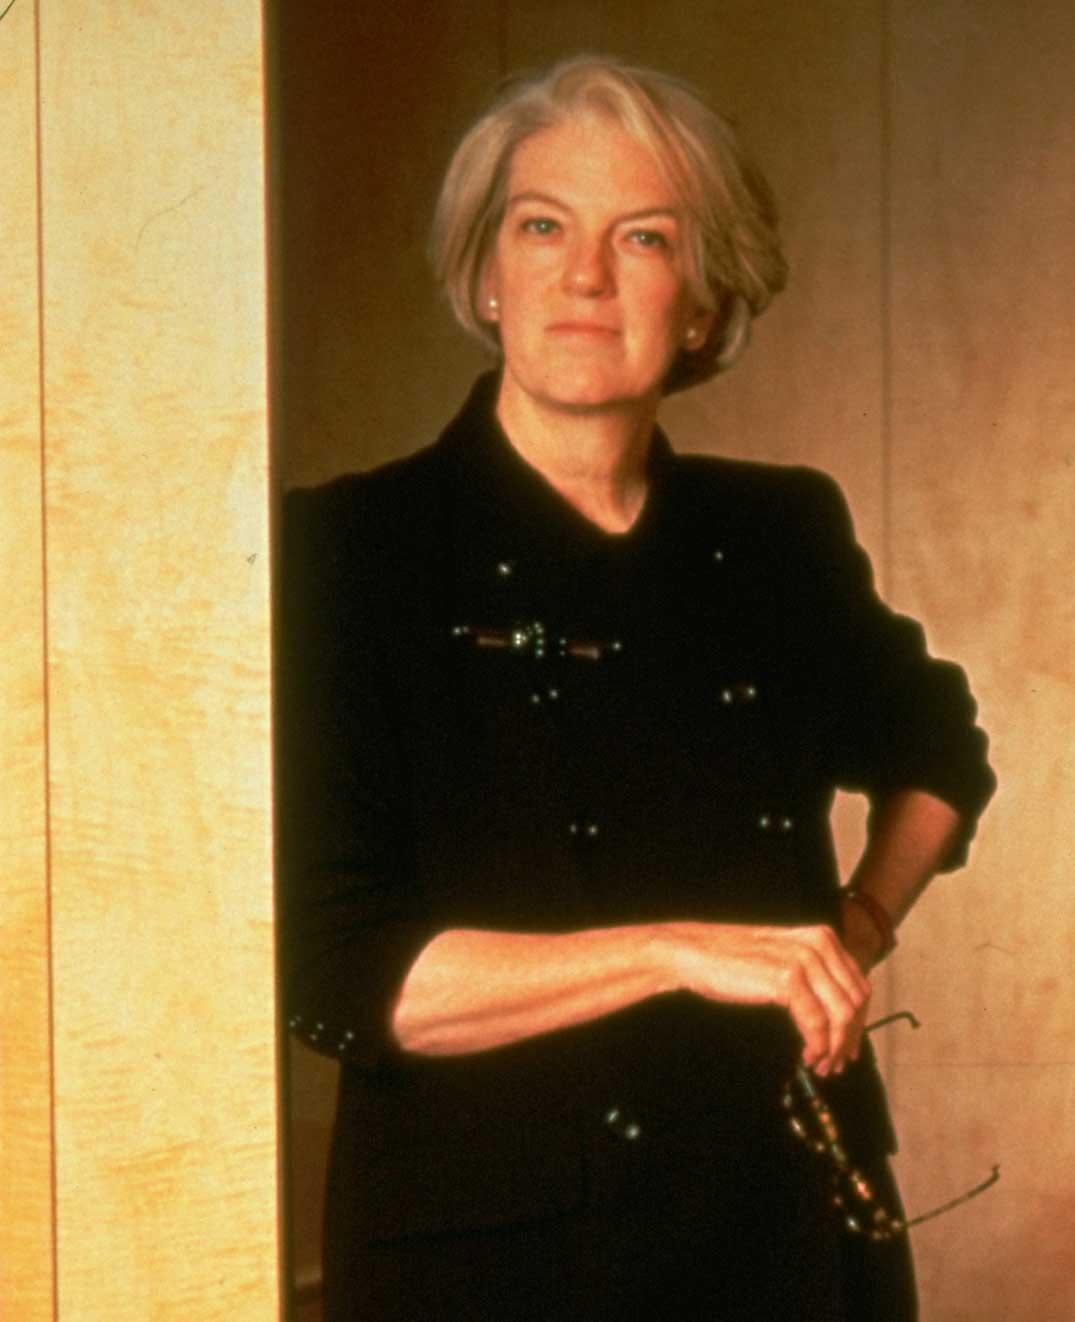 Marjorie Scardino 1998